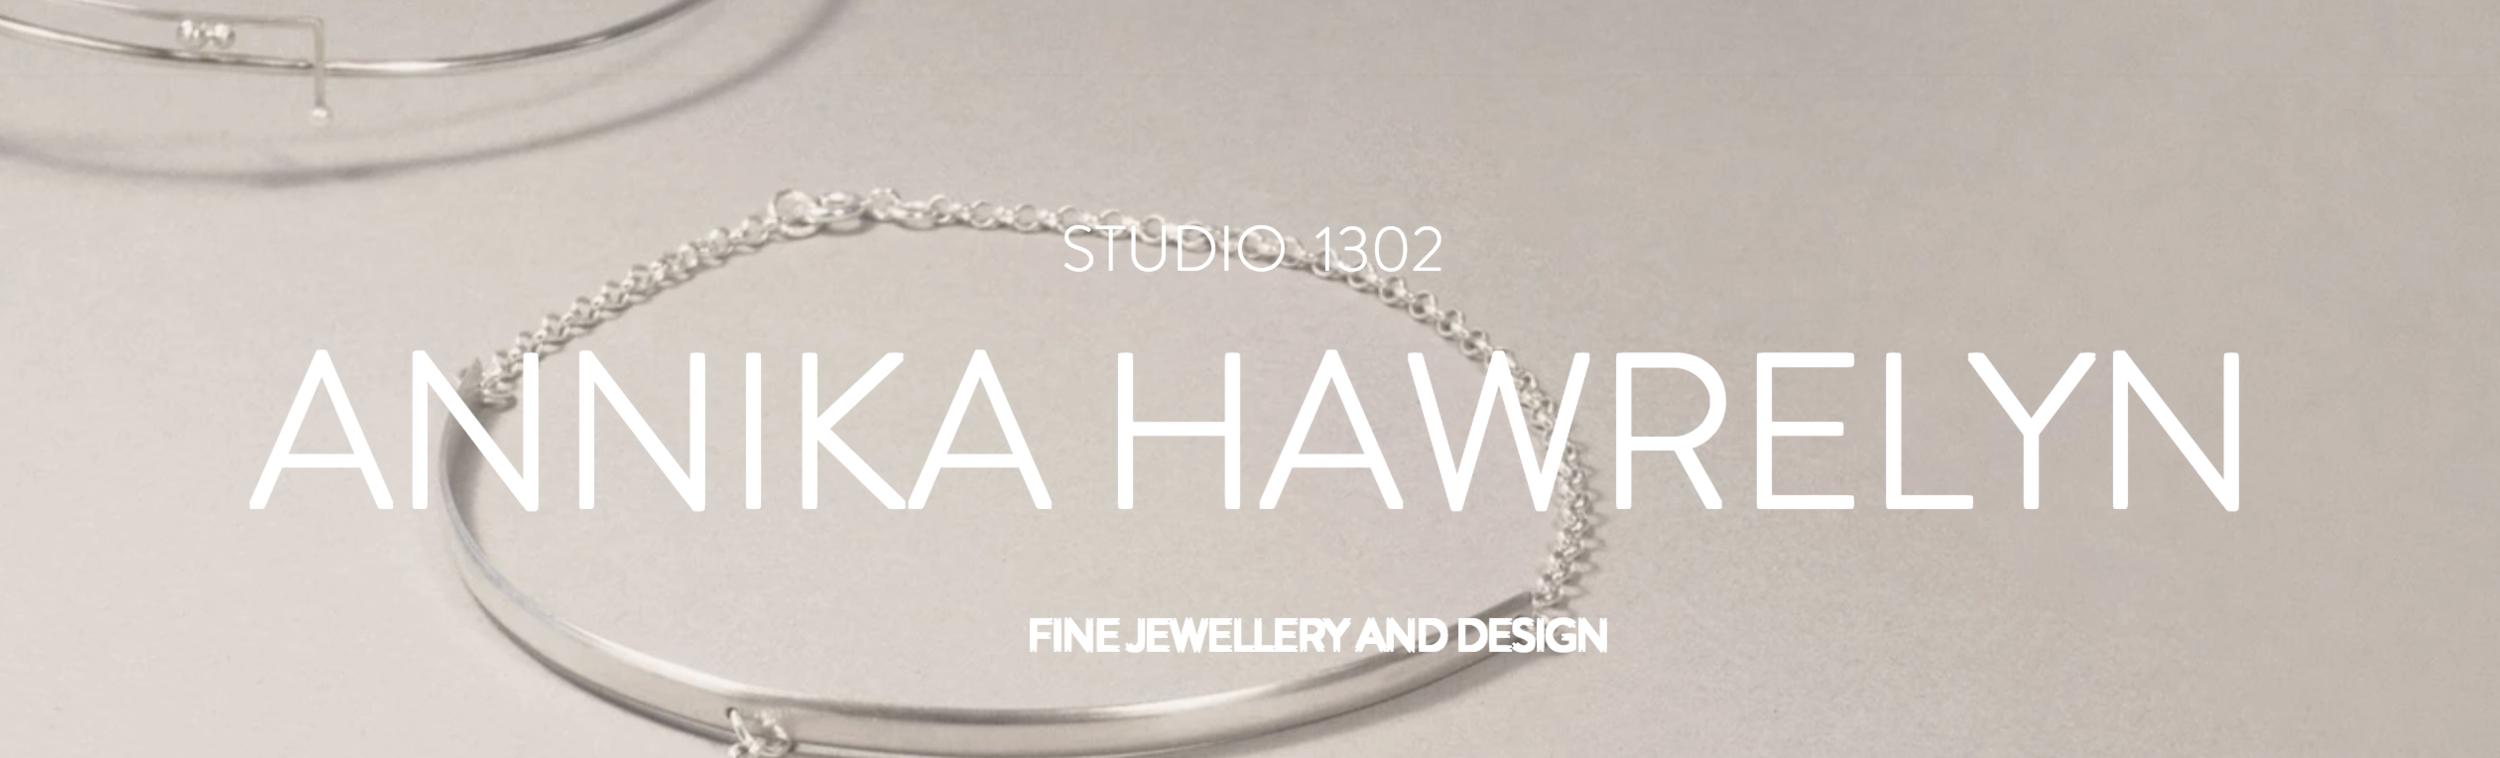 STUDIO  1302 ANNIKA HAWRELYN FINE JEWELLERY AND DESIGN.png